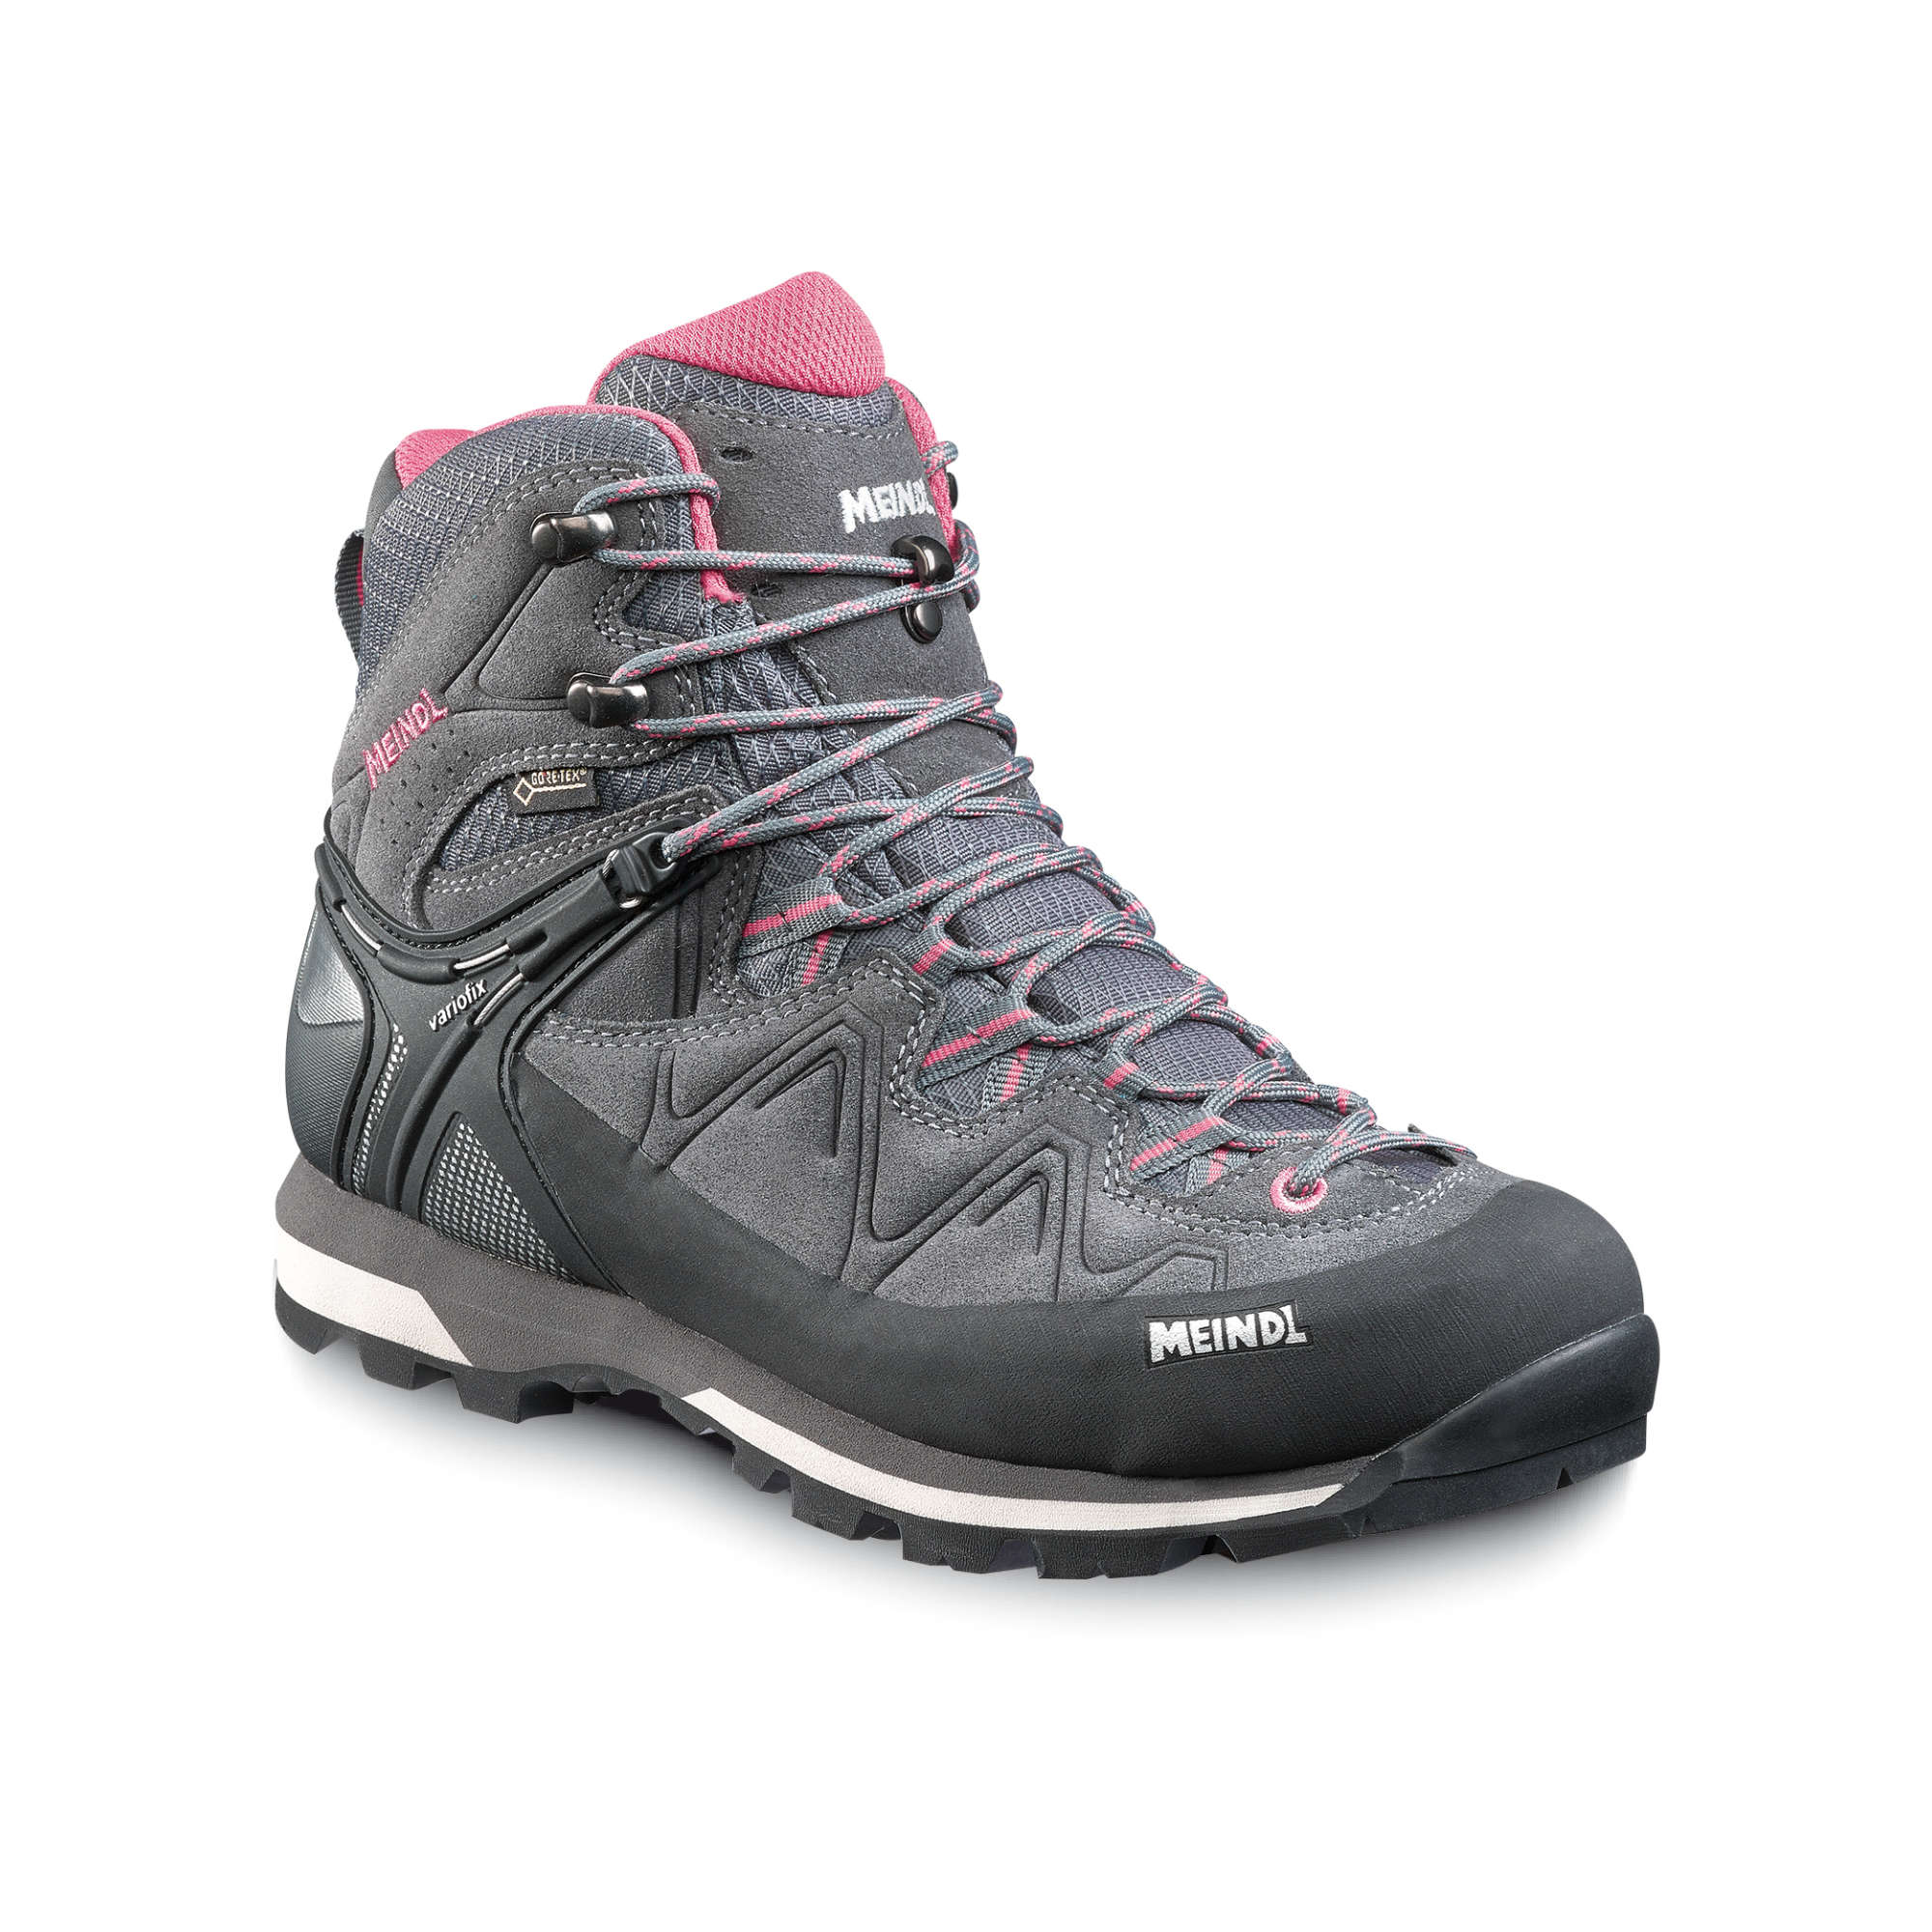 Details about  /Meindl Tonal Lady GTX Women/'s Hiking Boots Trekking Shoes Waterproof